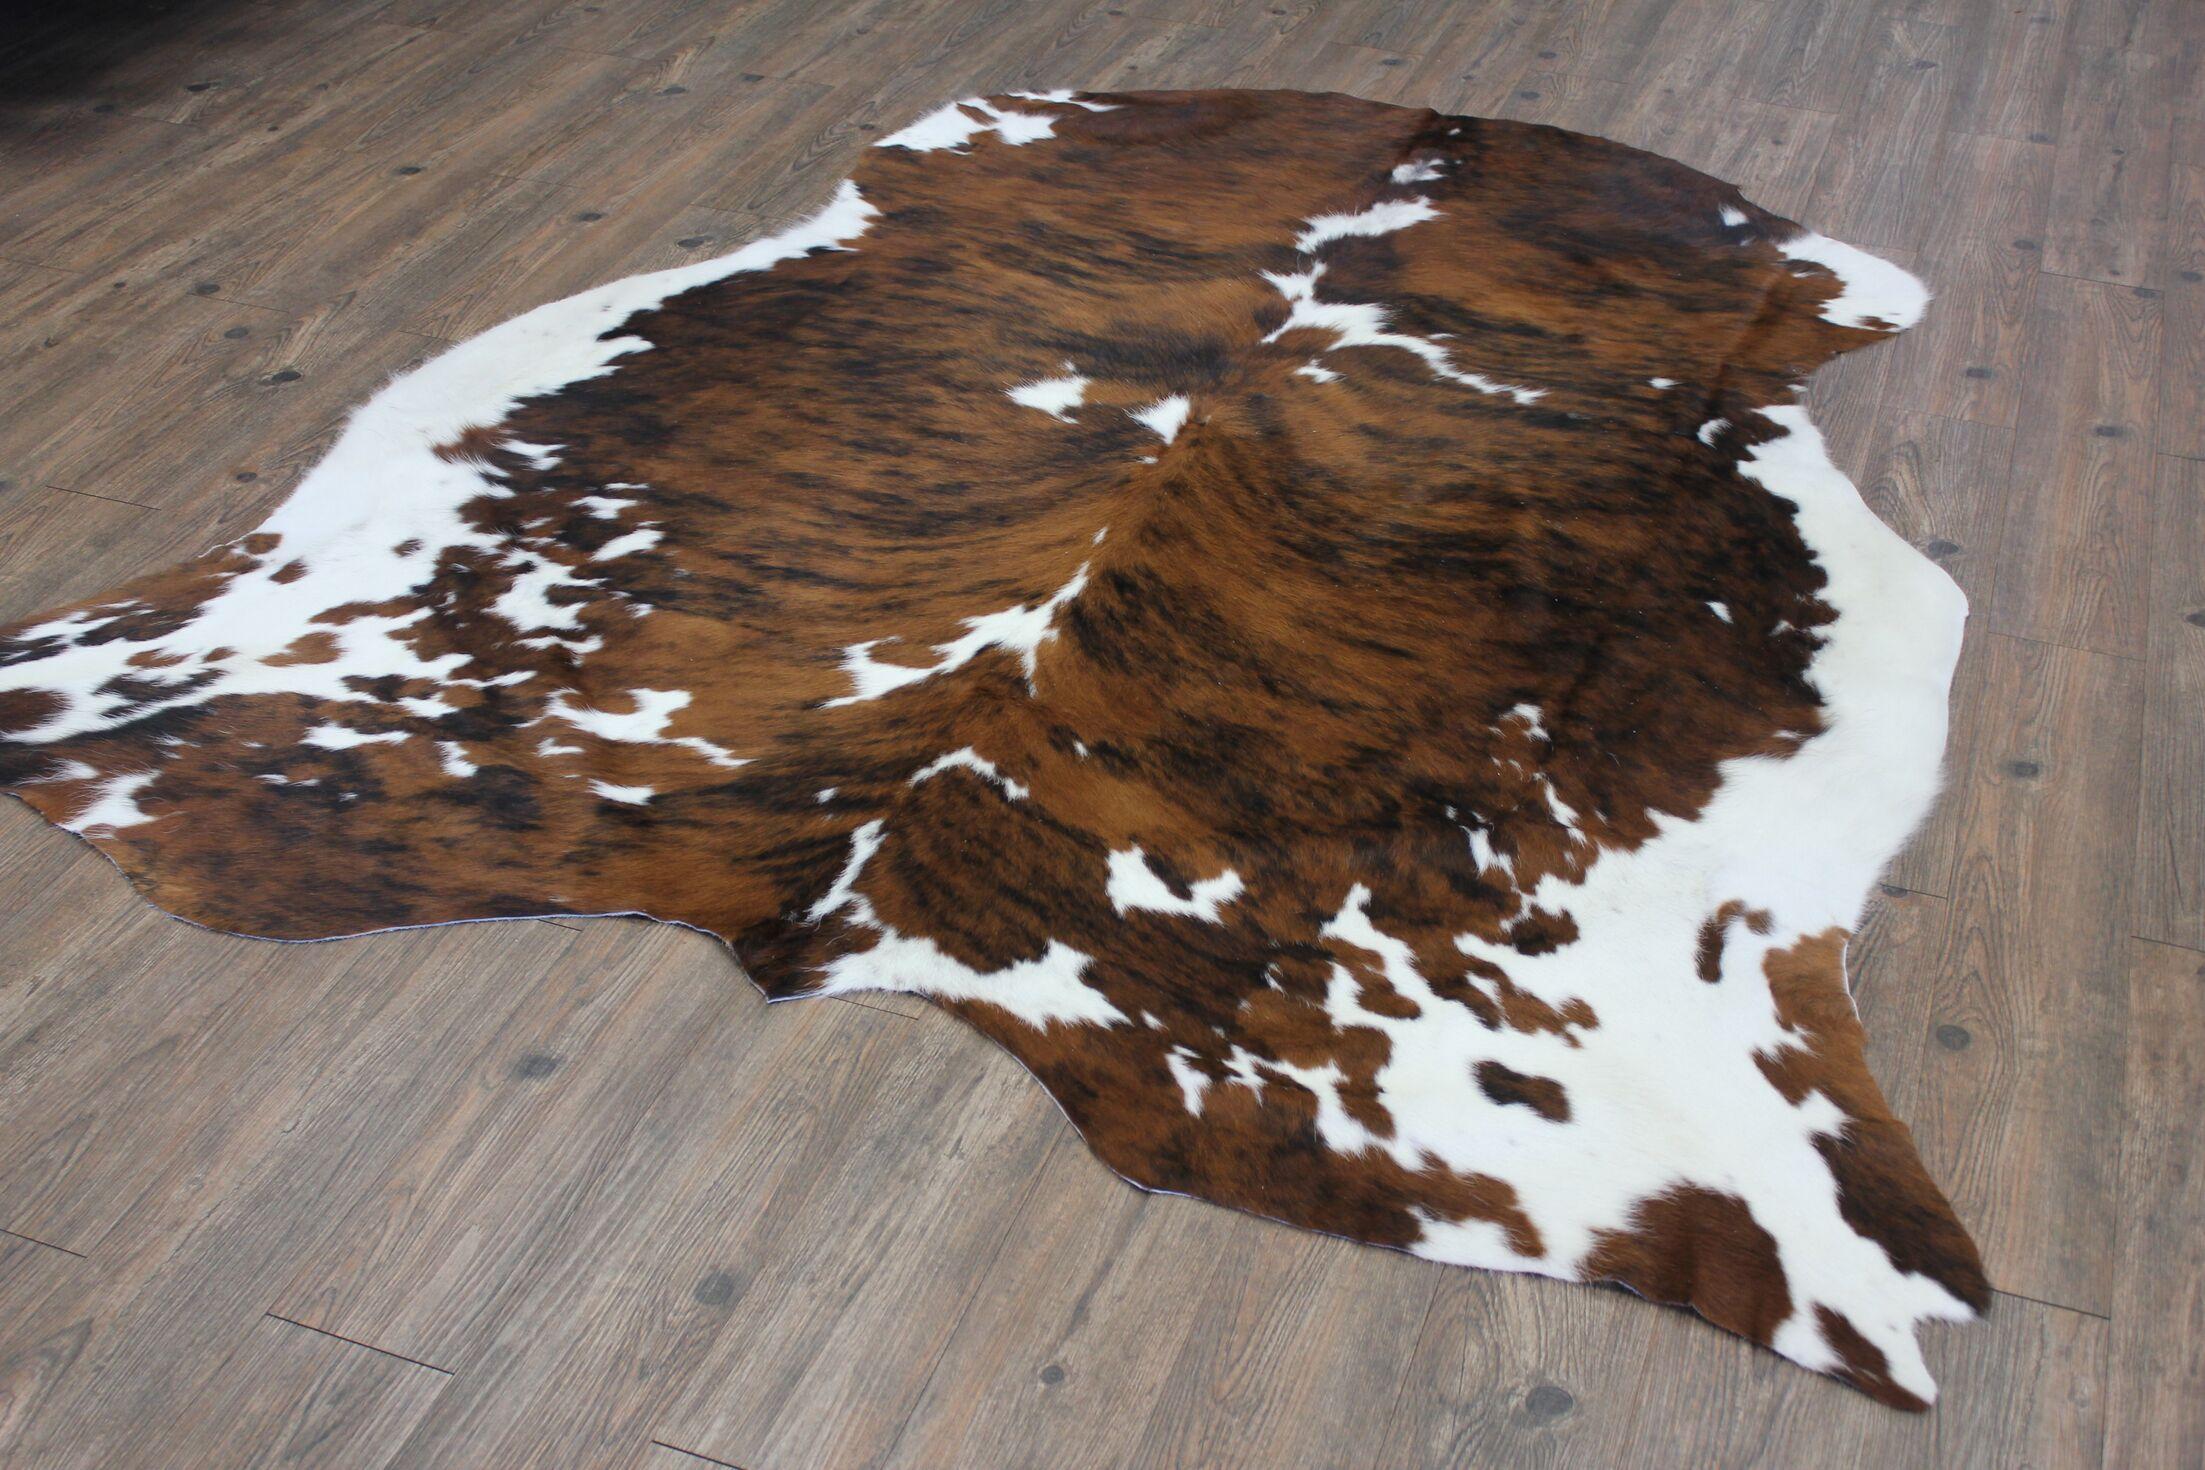 Thurso Hand-Woven Cowhide Brown Area Rug